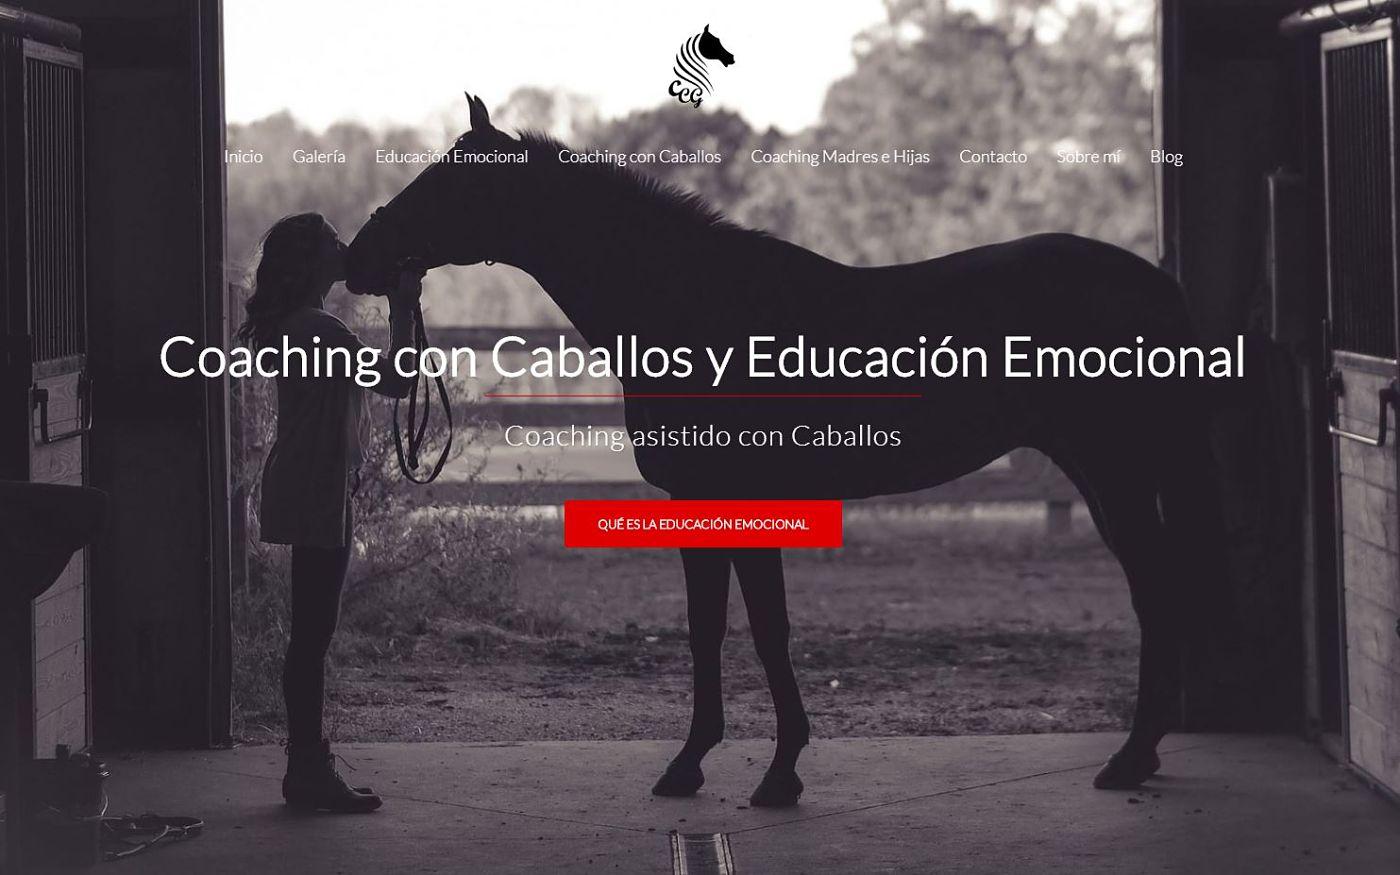 diseño para coach caballos madrid